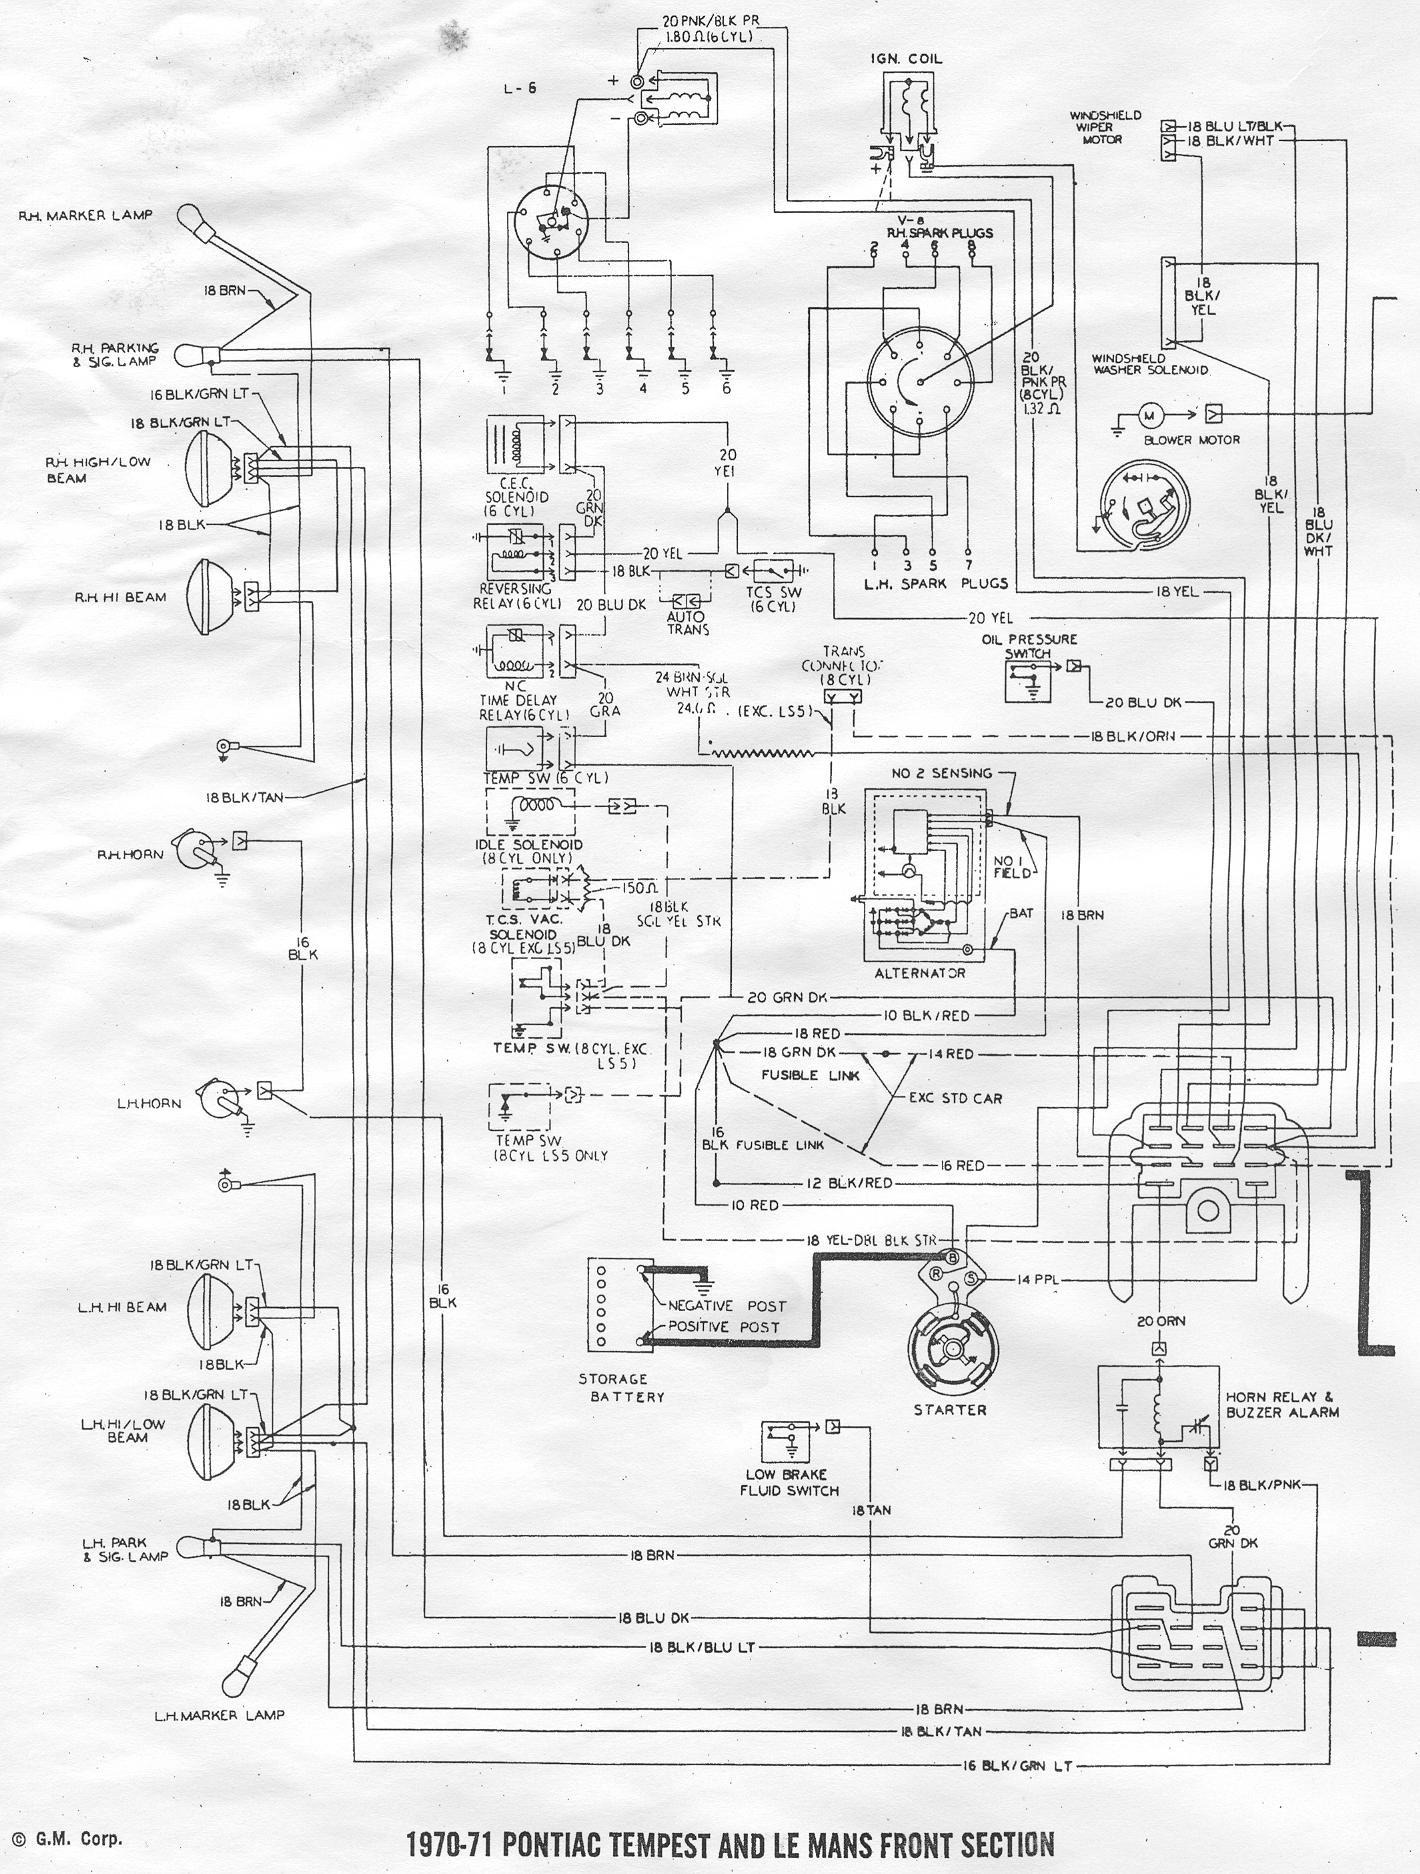 1967 oldsmobile wiring diagram 1967 wiring diagrams